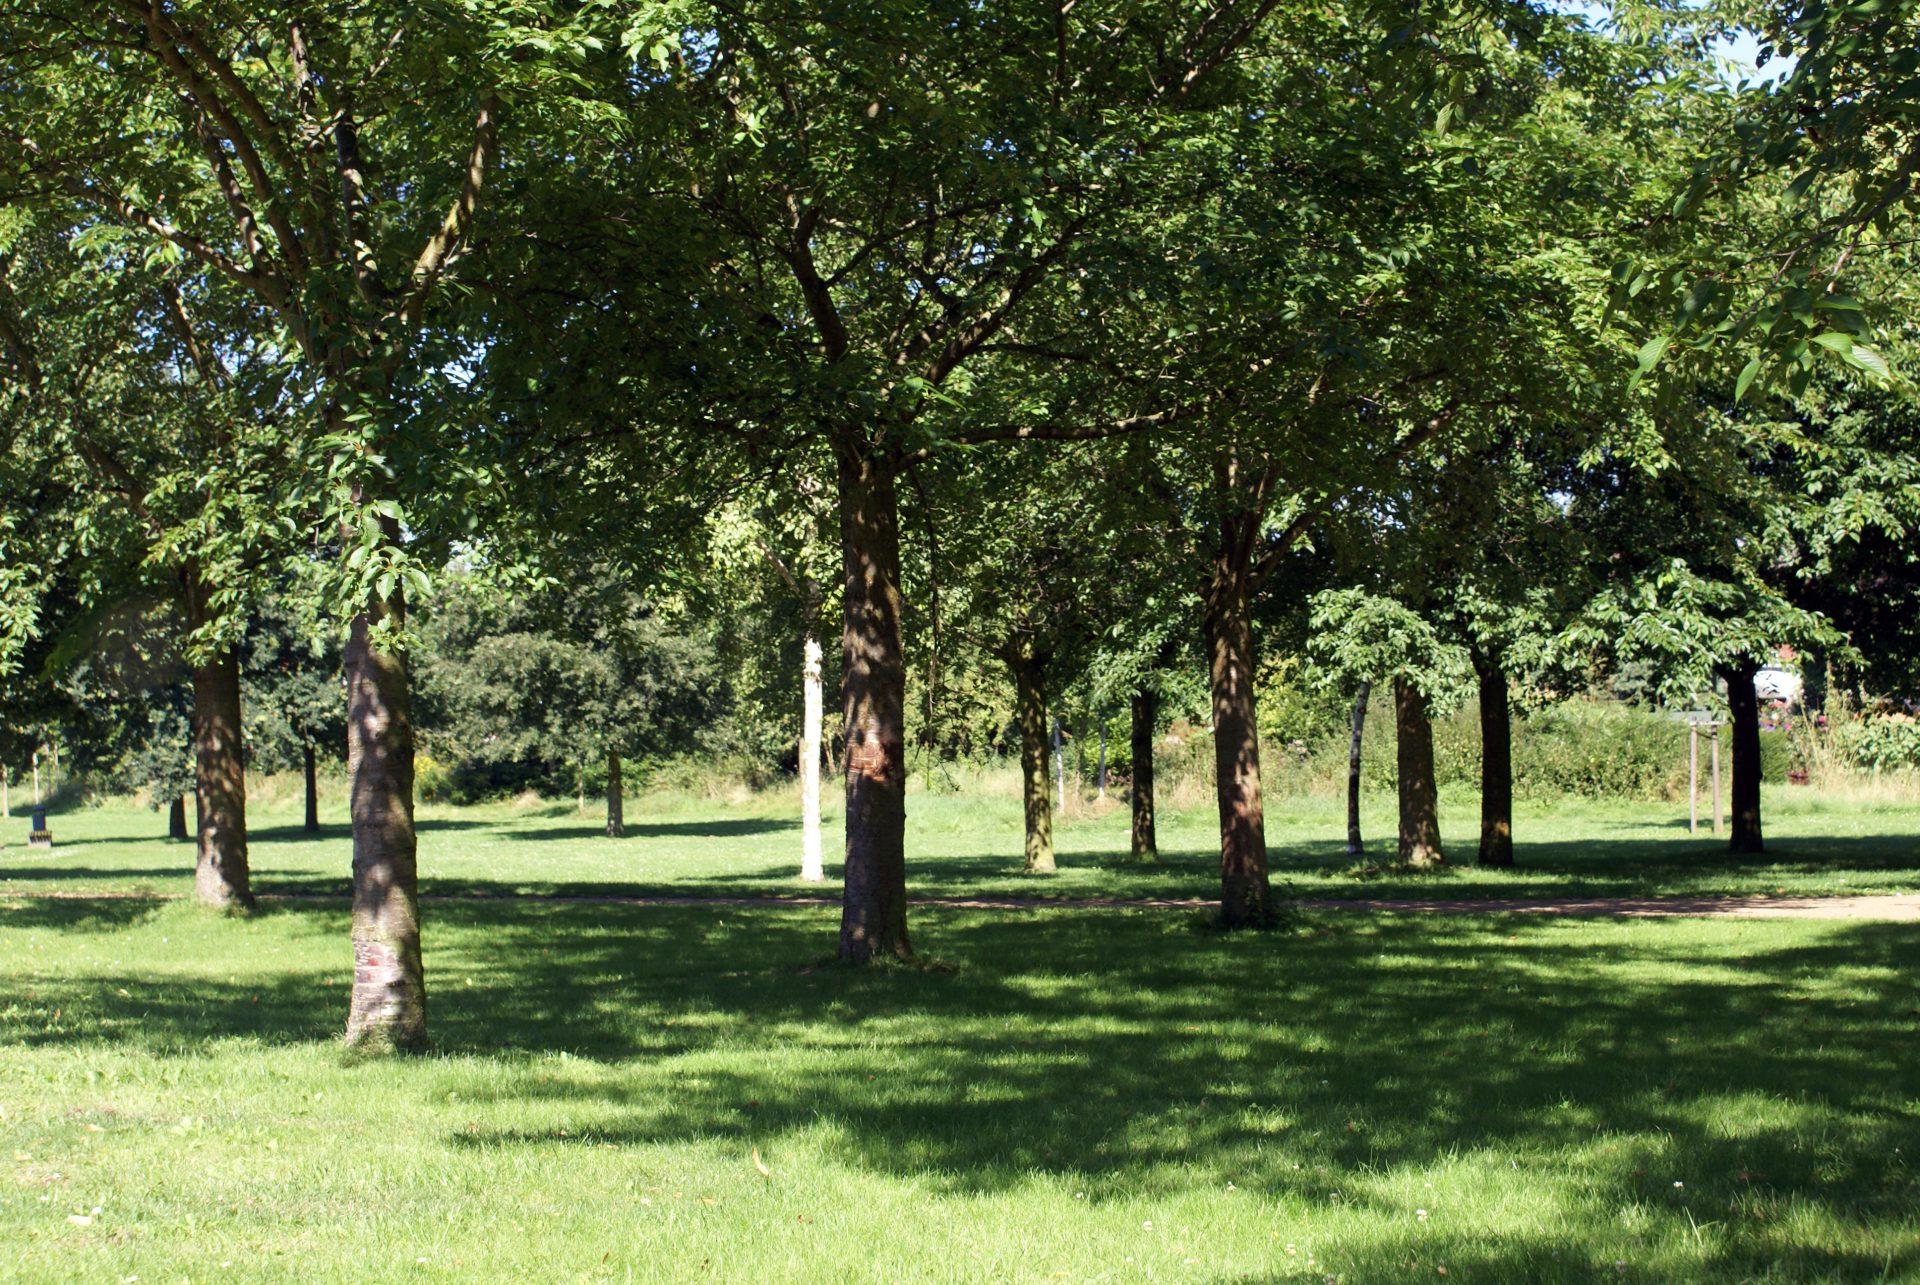 Jubiläumsgarten Viersen